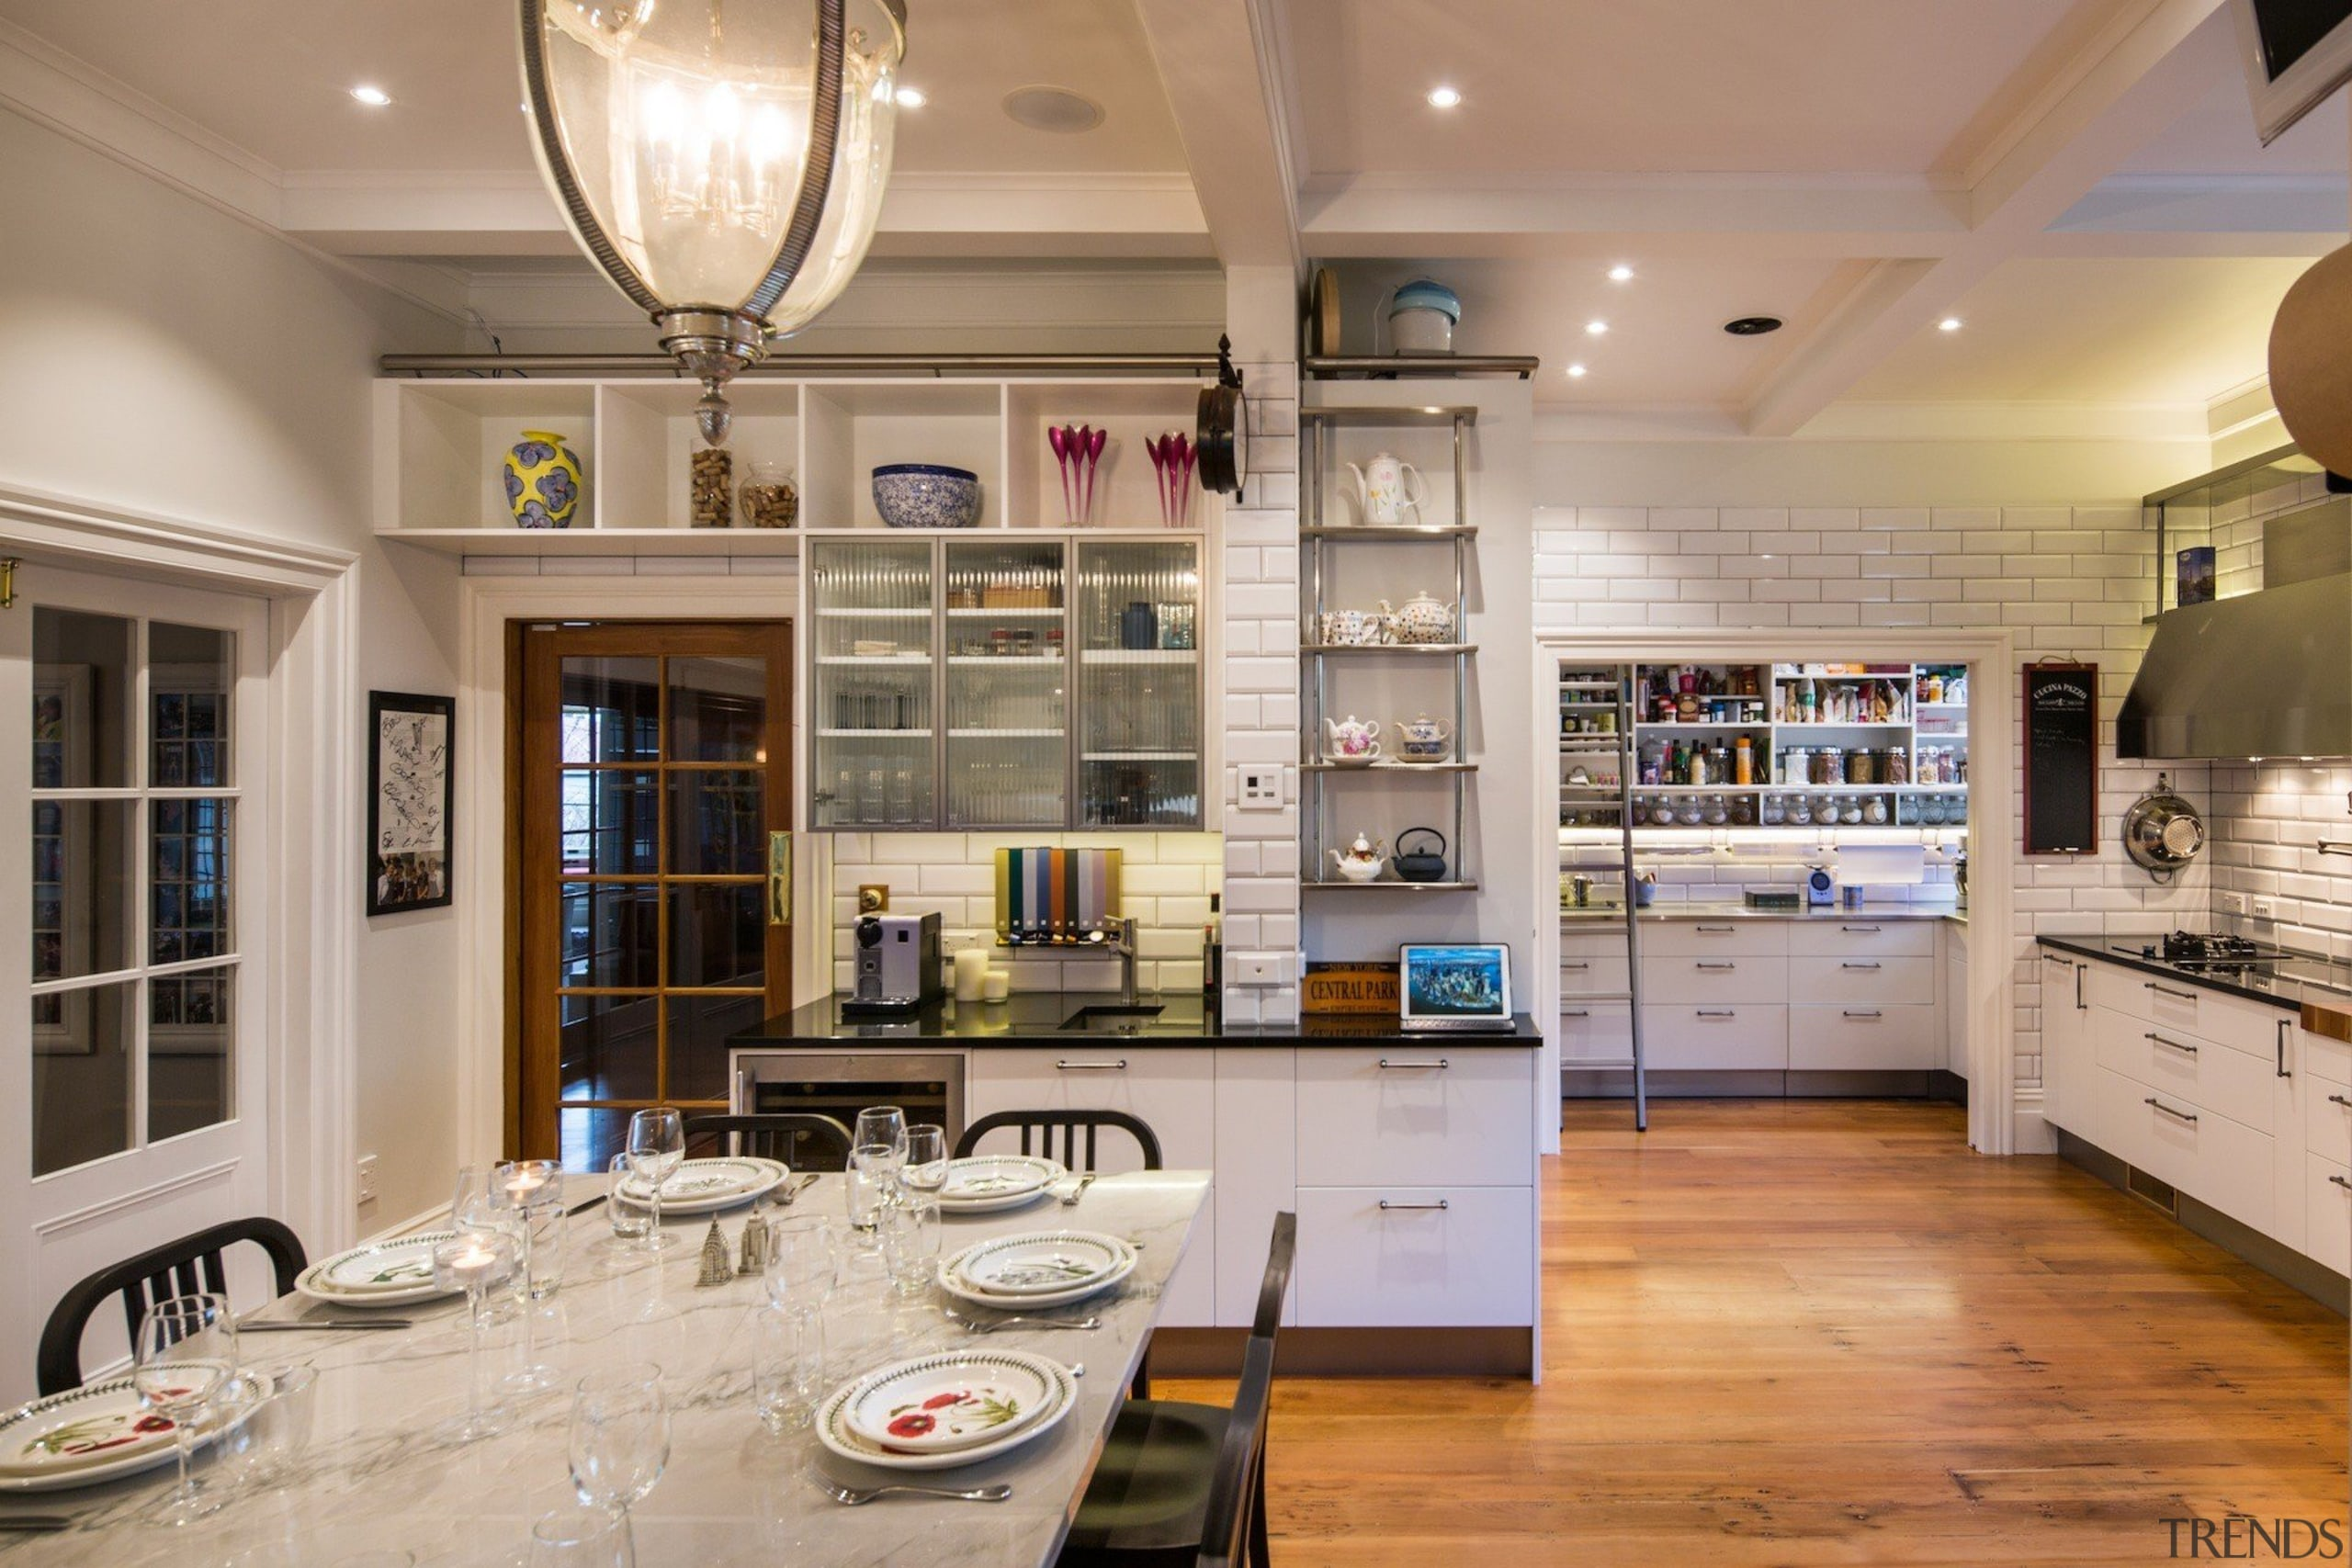 Encompass Ideas Interior Design – TIDA New countertop, interior design, kitchen, room, gray, brown